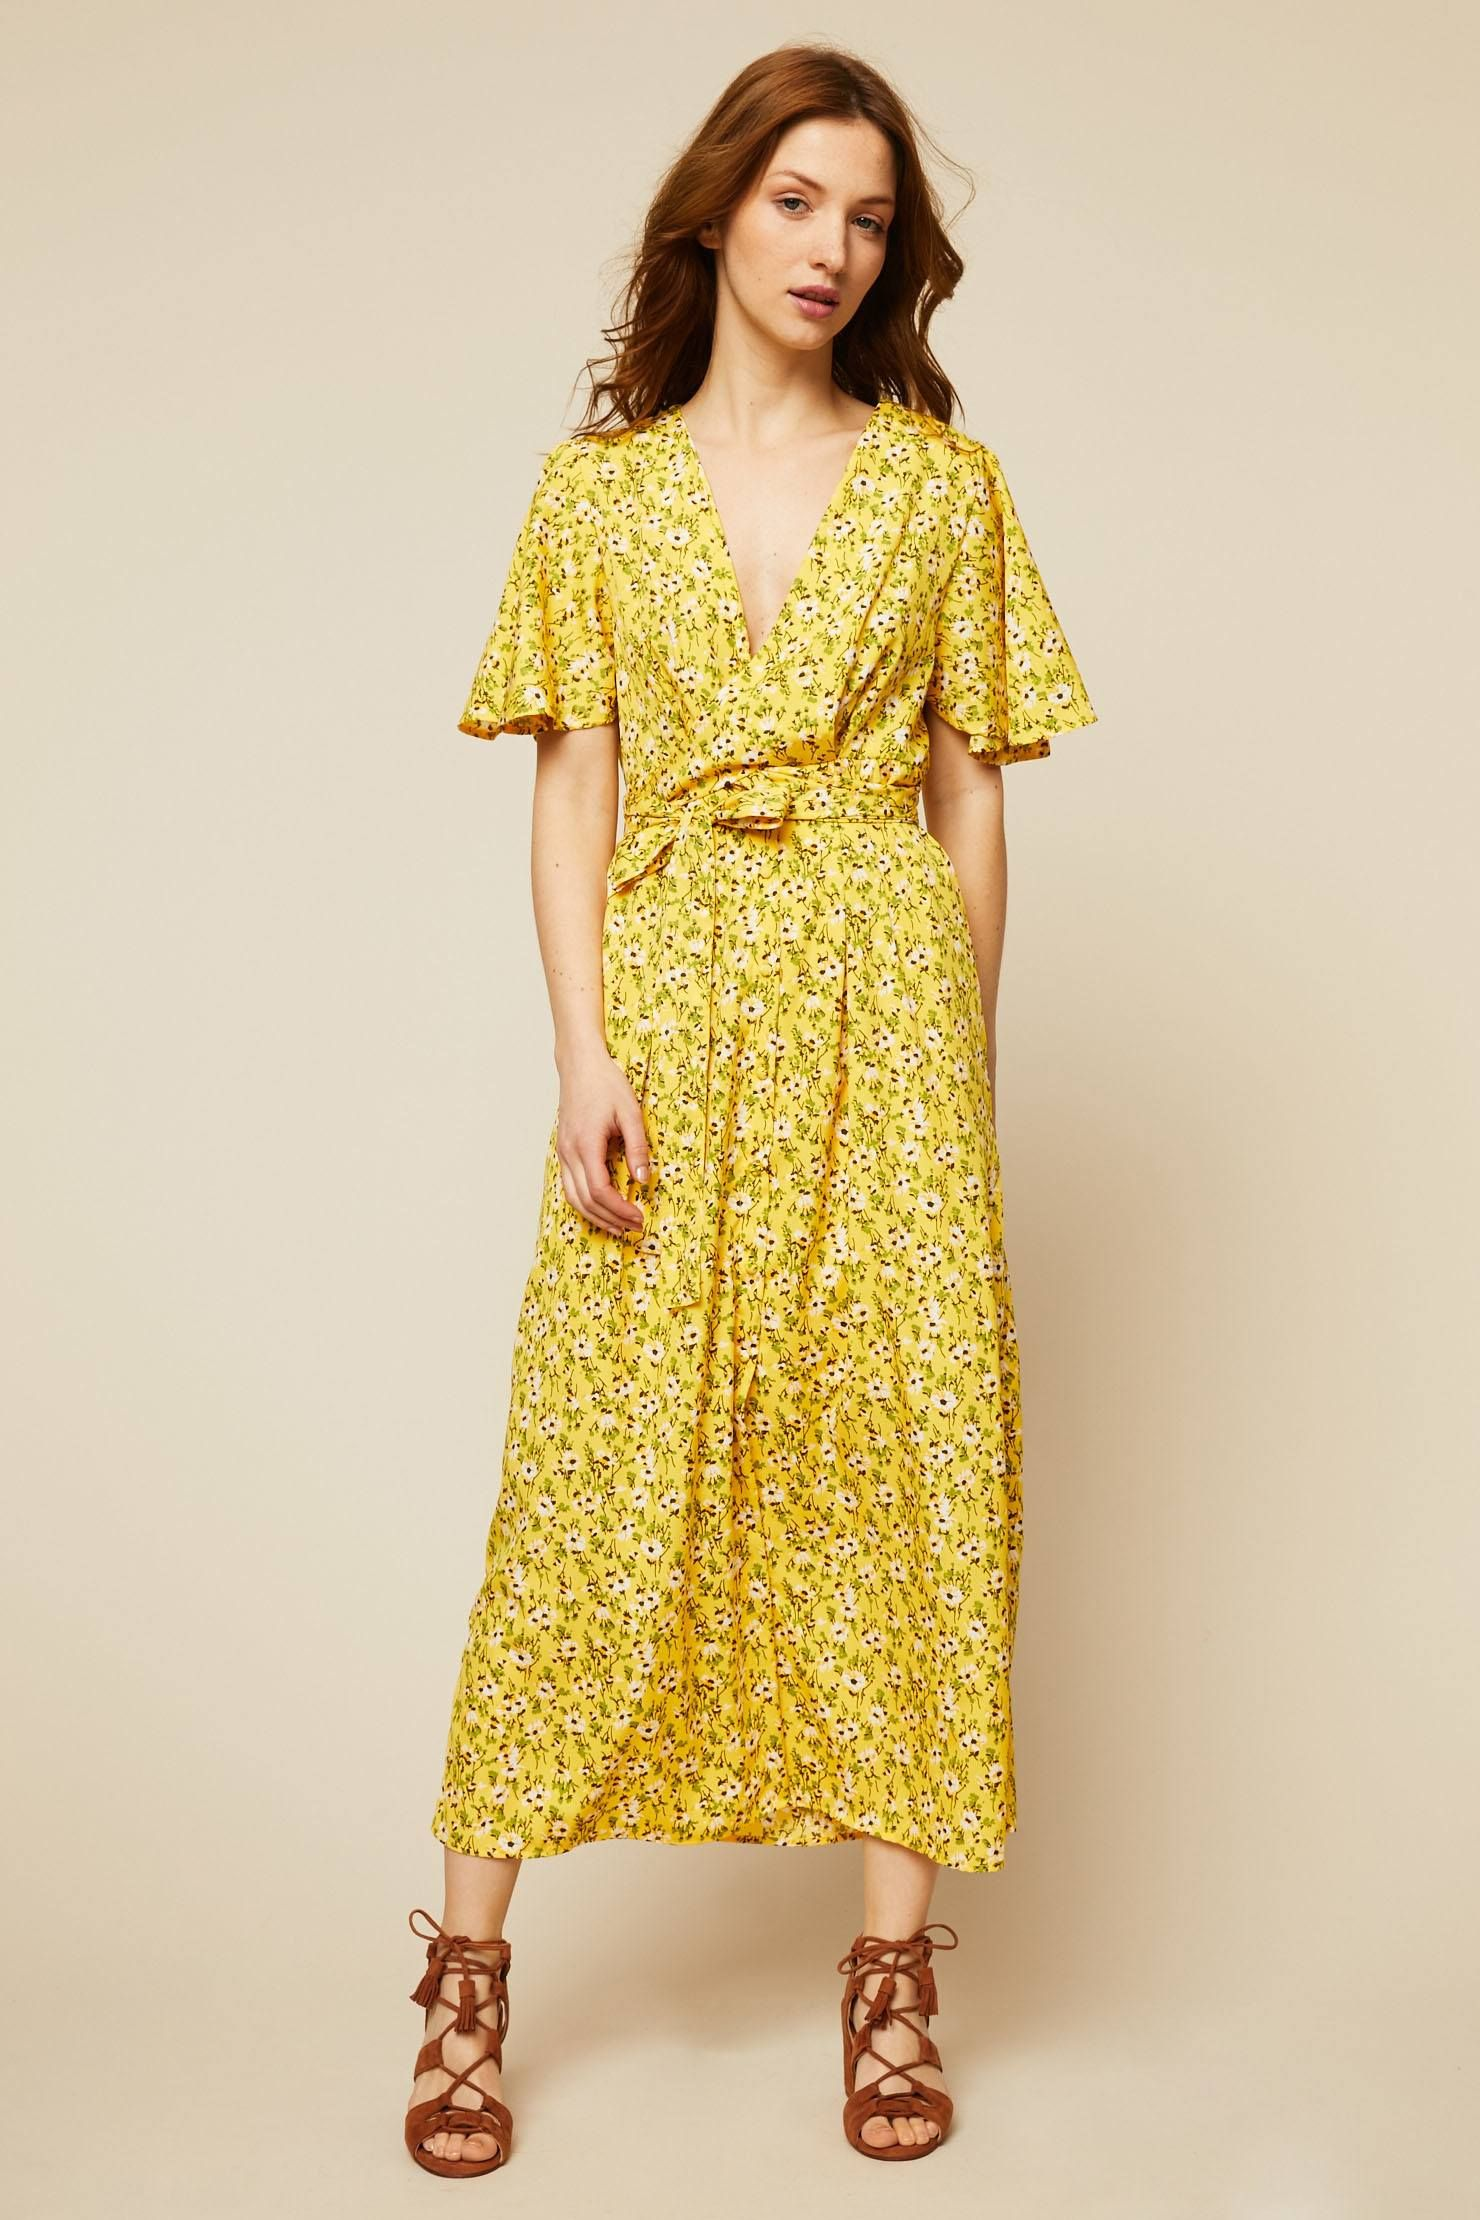 Robe Cache Coeur Jaune Imprime Floral Zoom Vero Moda Robe Robe Longue